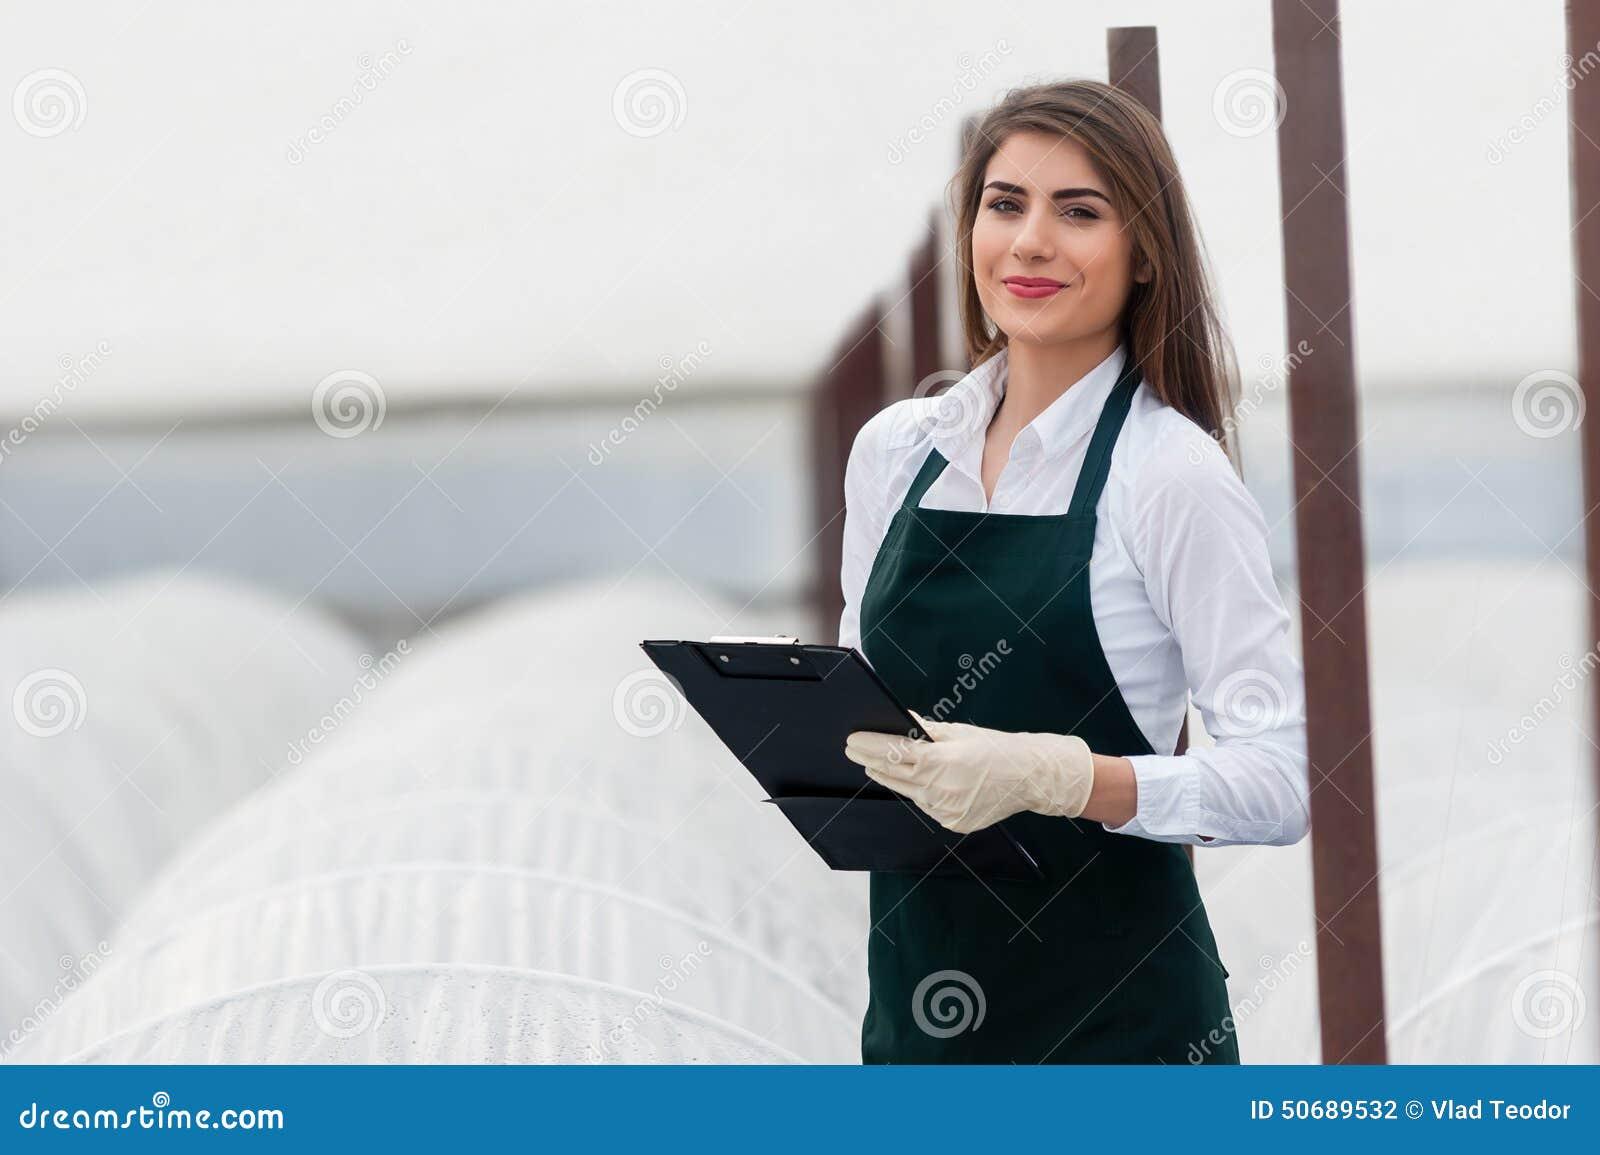 Download 生物食物生产 库存照片. 图片 包括有 评定, 衣裳, 化学家, 生物, 切片检查法, 女性, 工程, 沾染 - 50689532